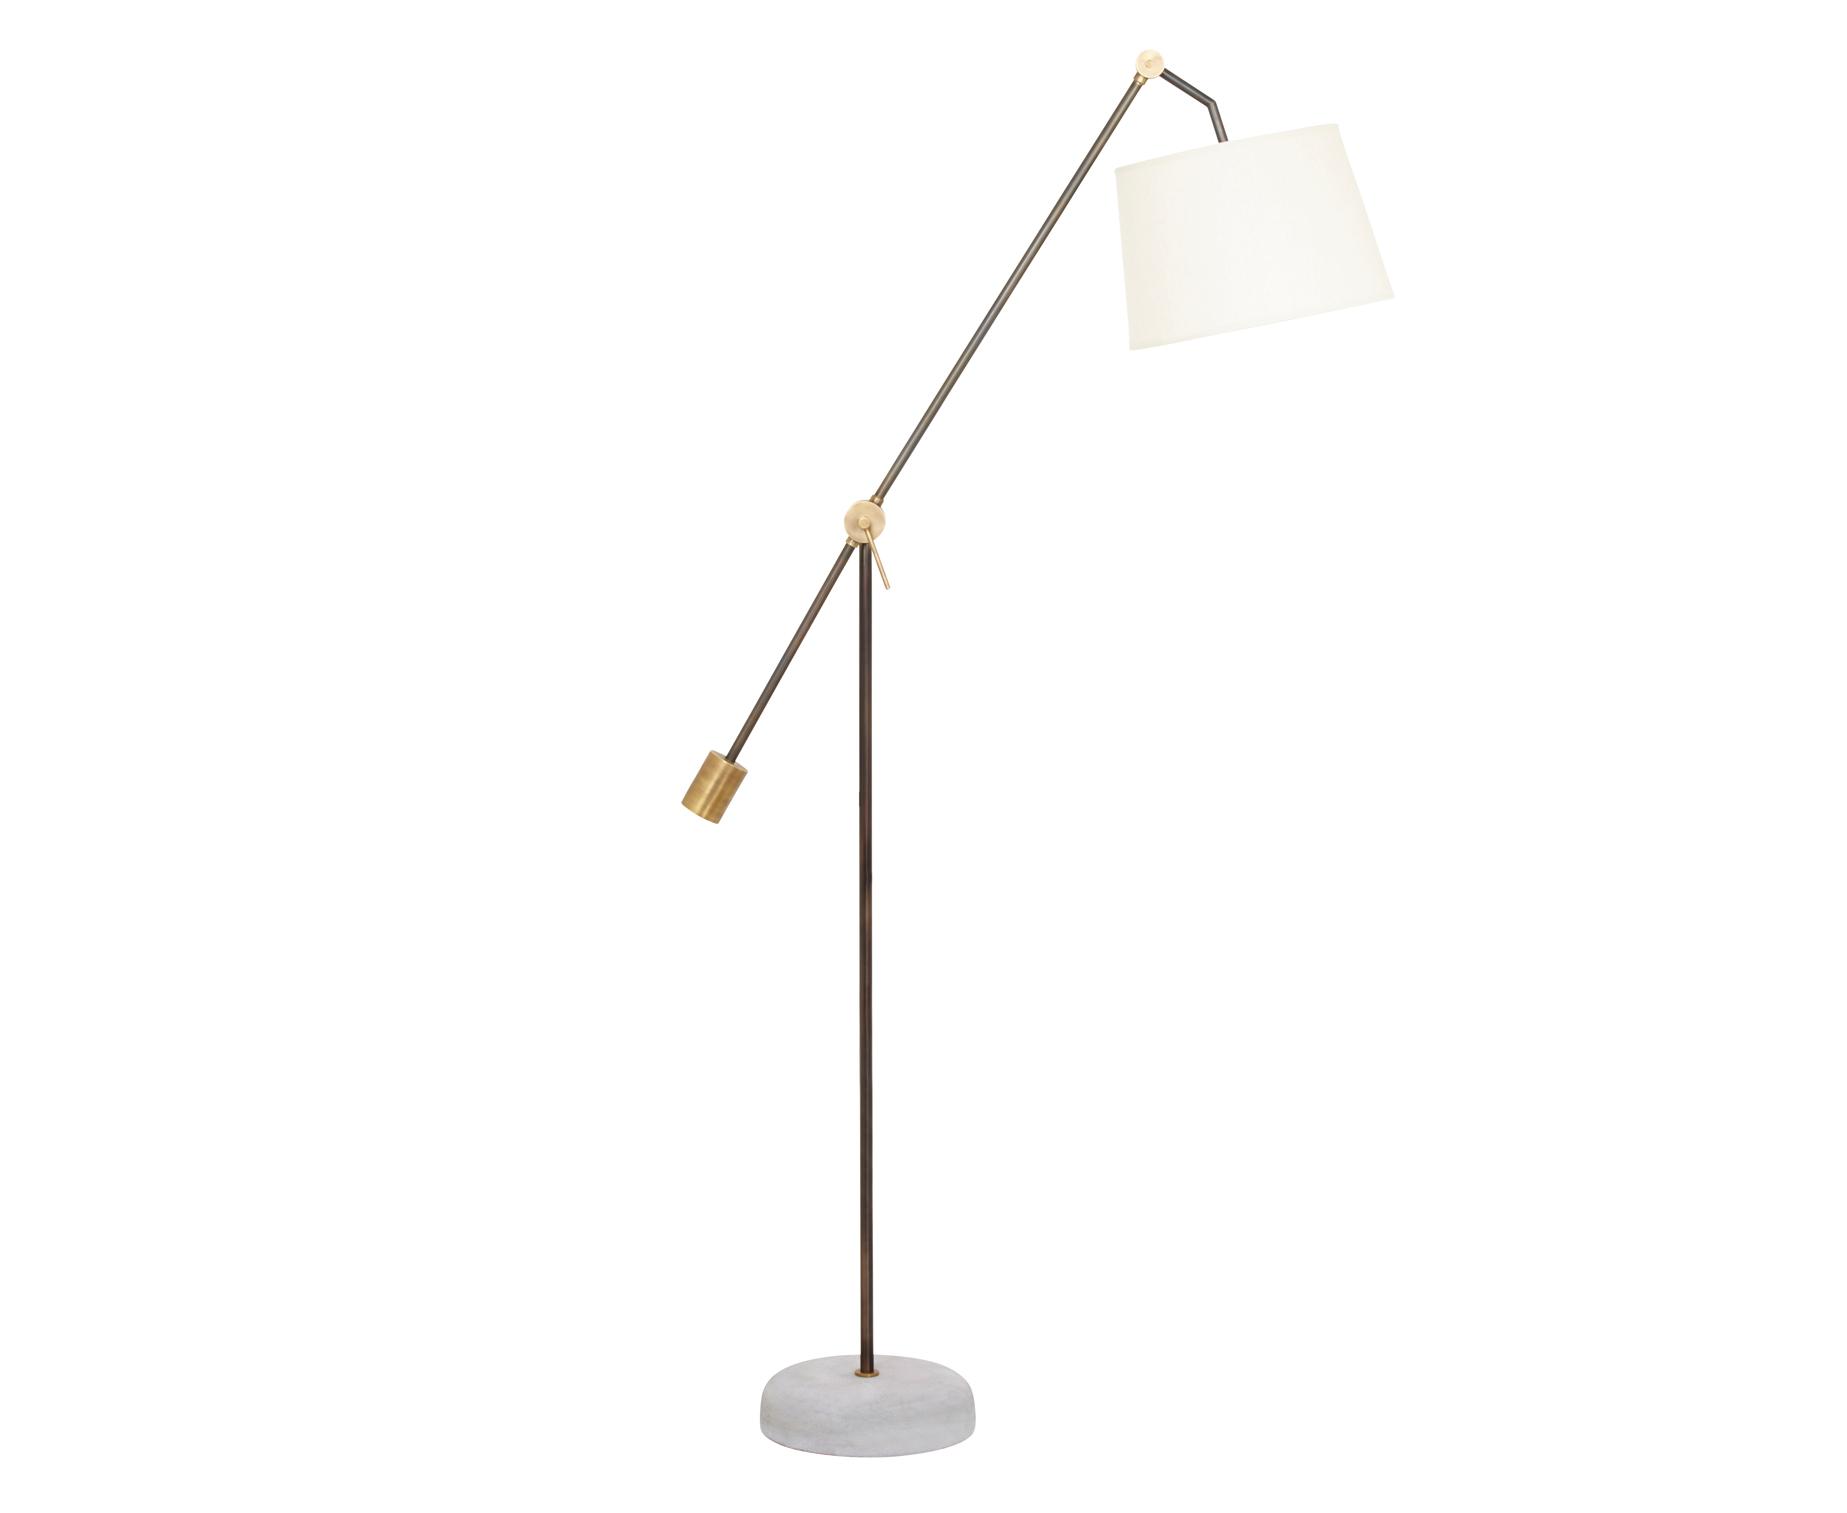 Bruges floor lamp